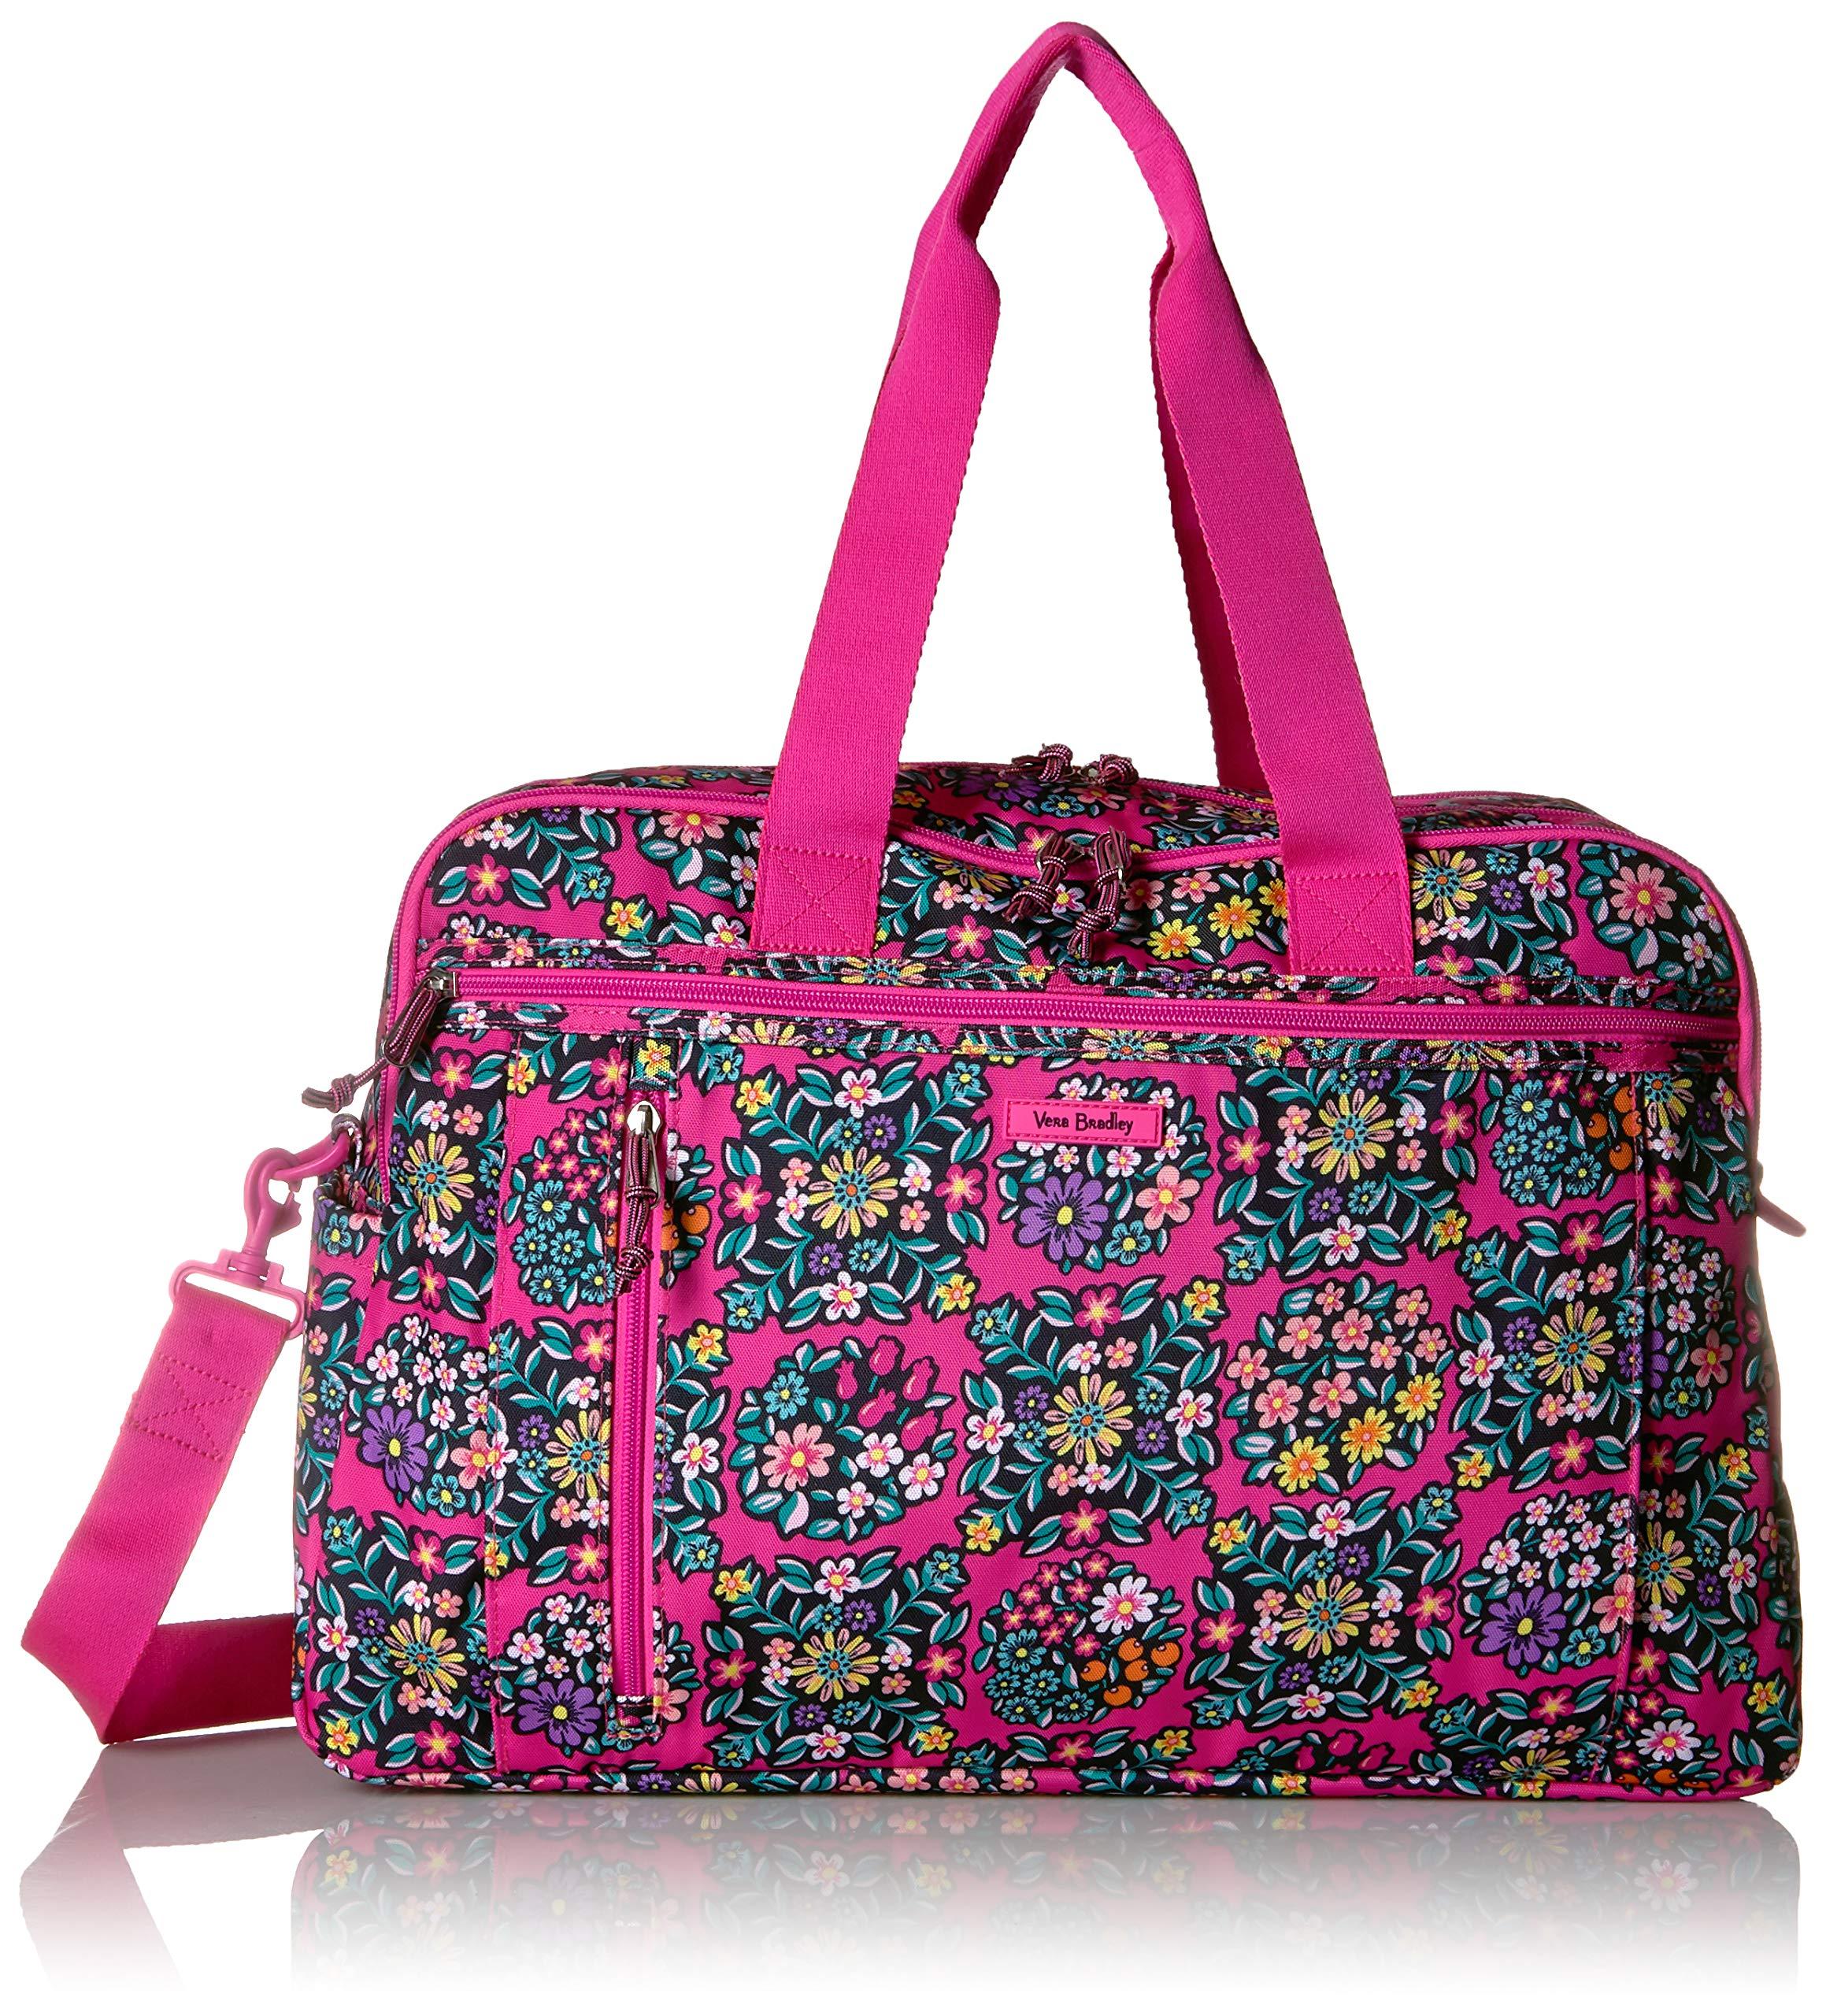 Vera Bradley Lighten Up Weekender Travel Bag, Kaleidoscope Rosettes